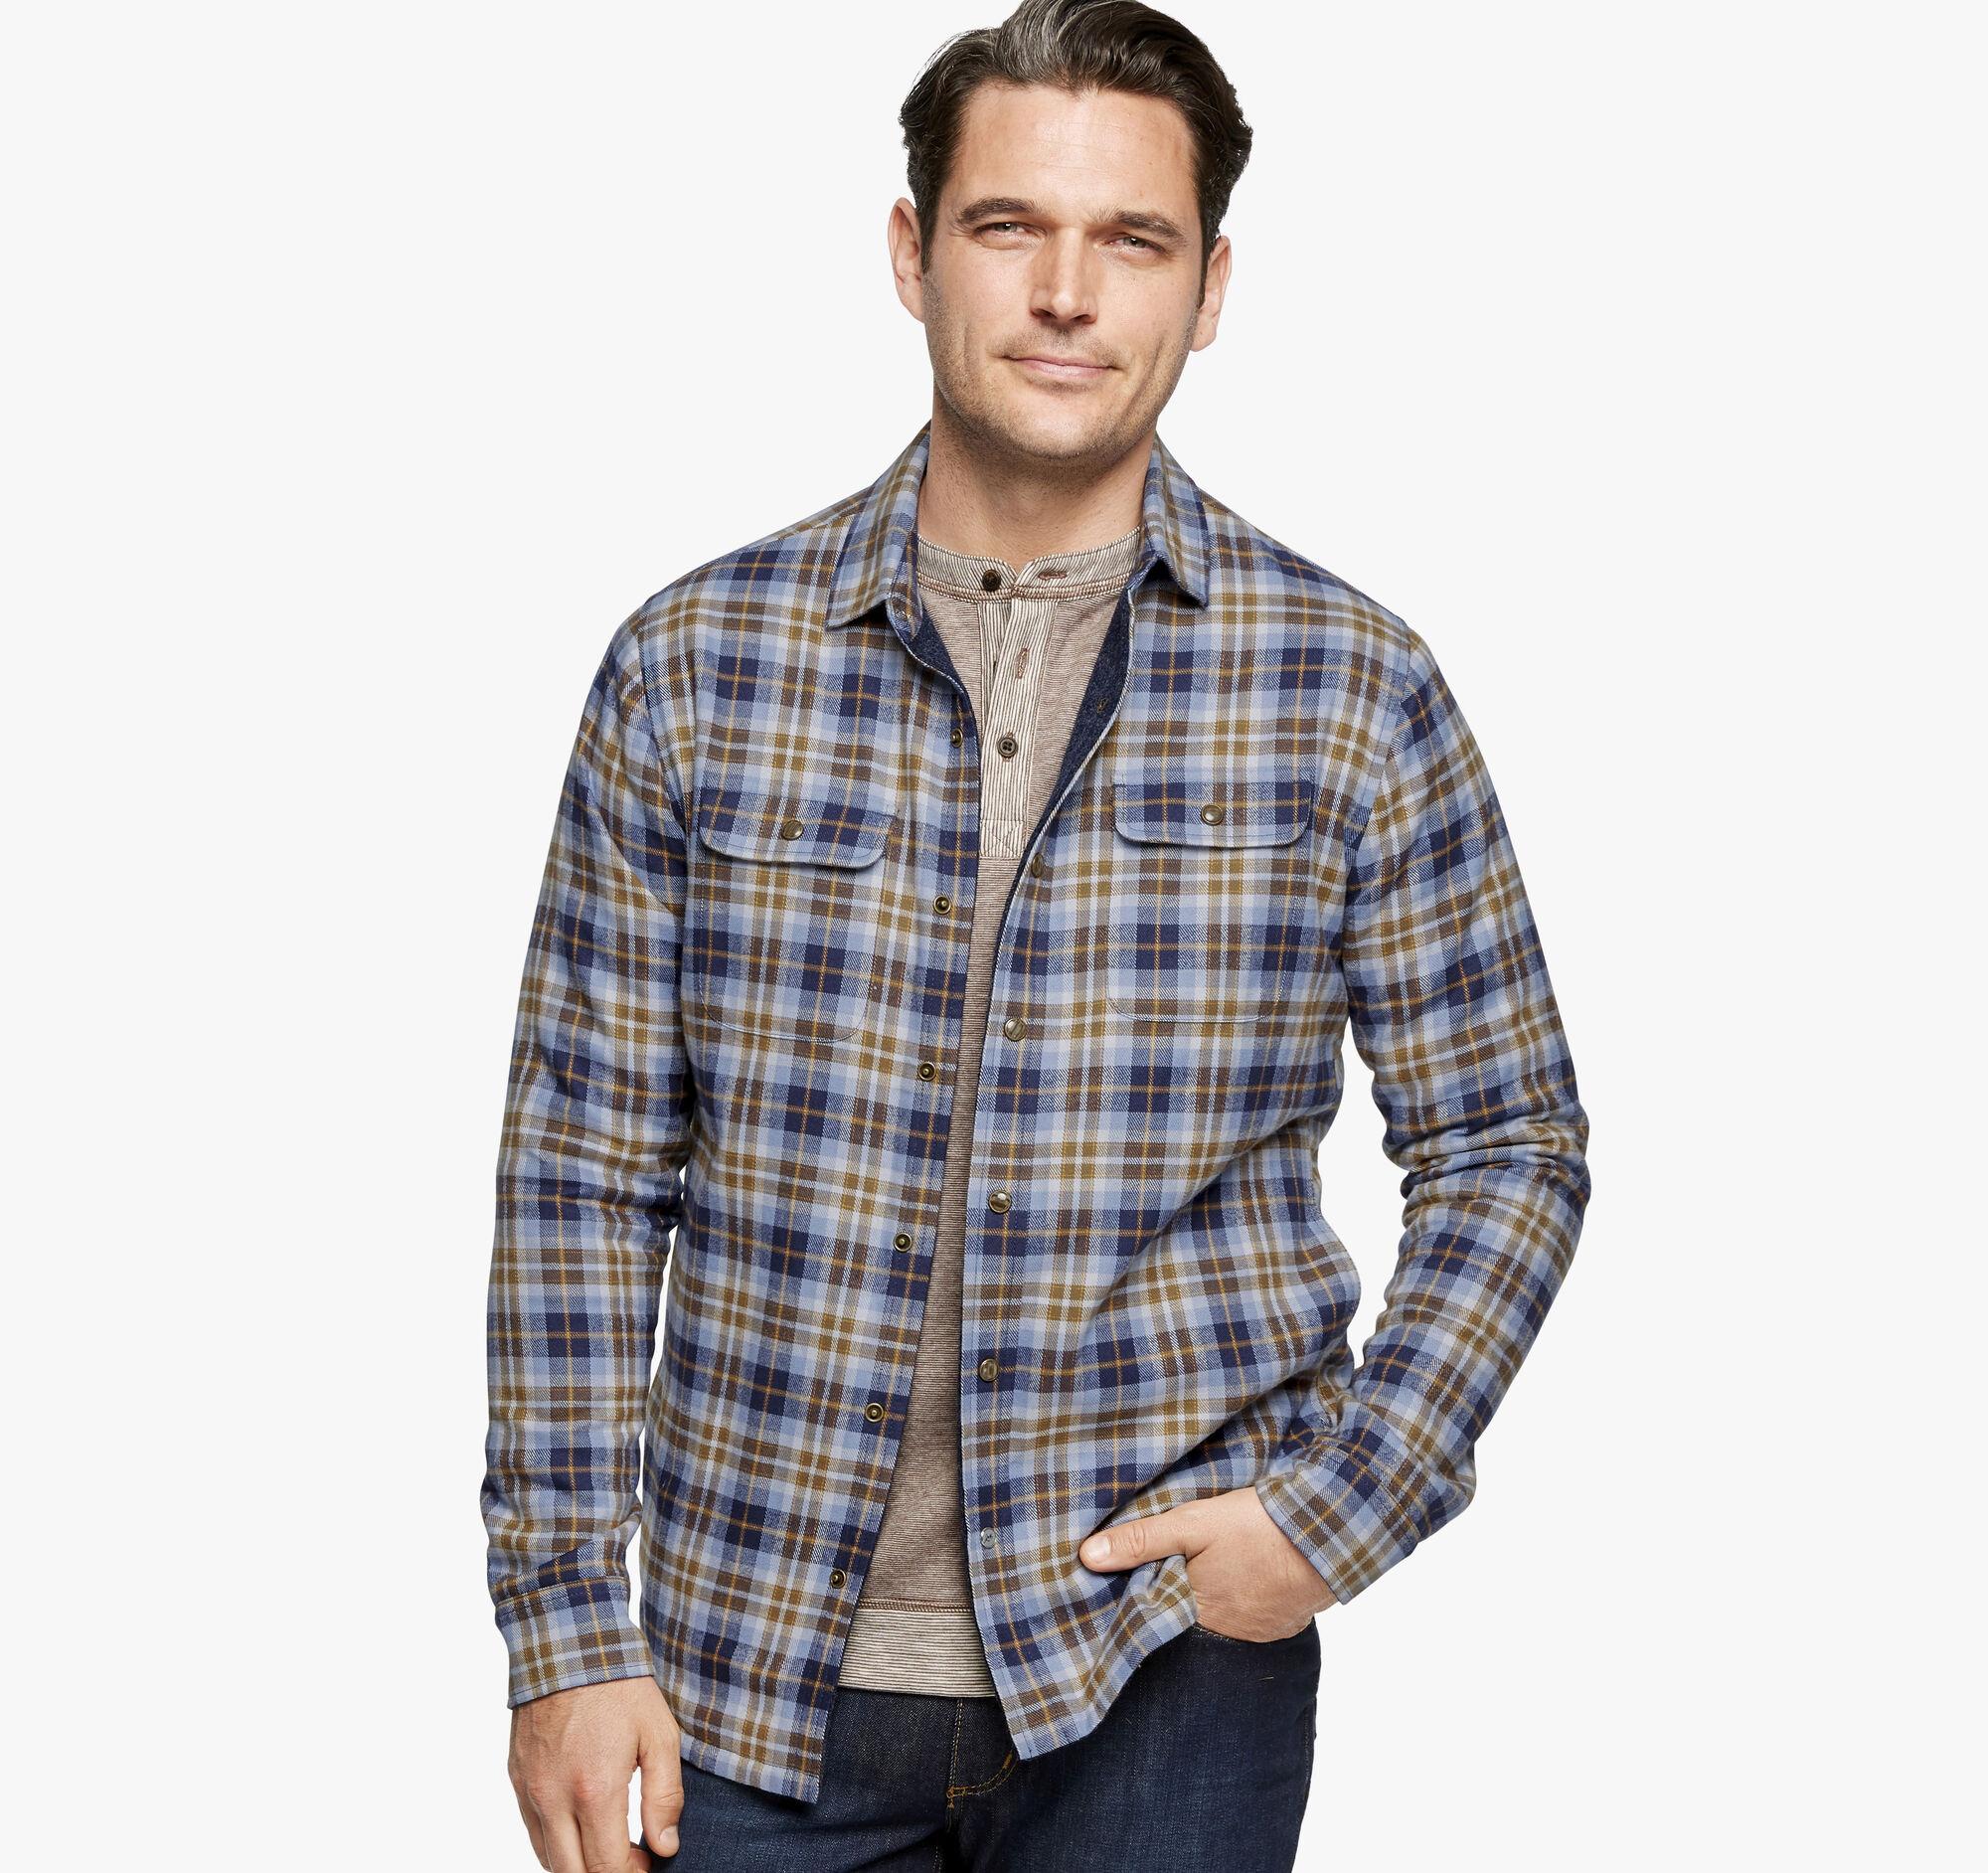 592cfeb421d4 Brushed Shirt Jackets | Johnston & Murphy